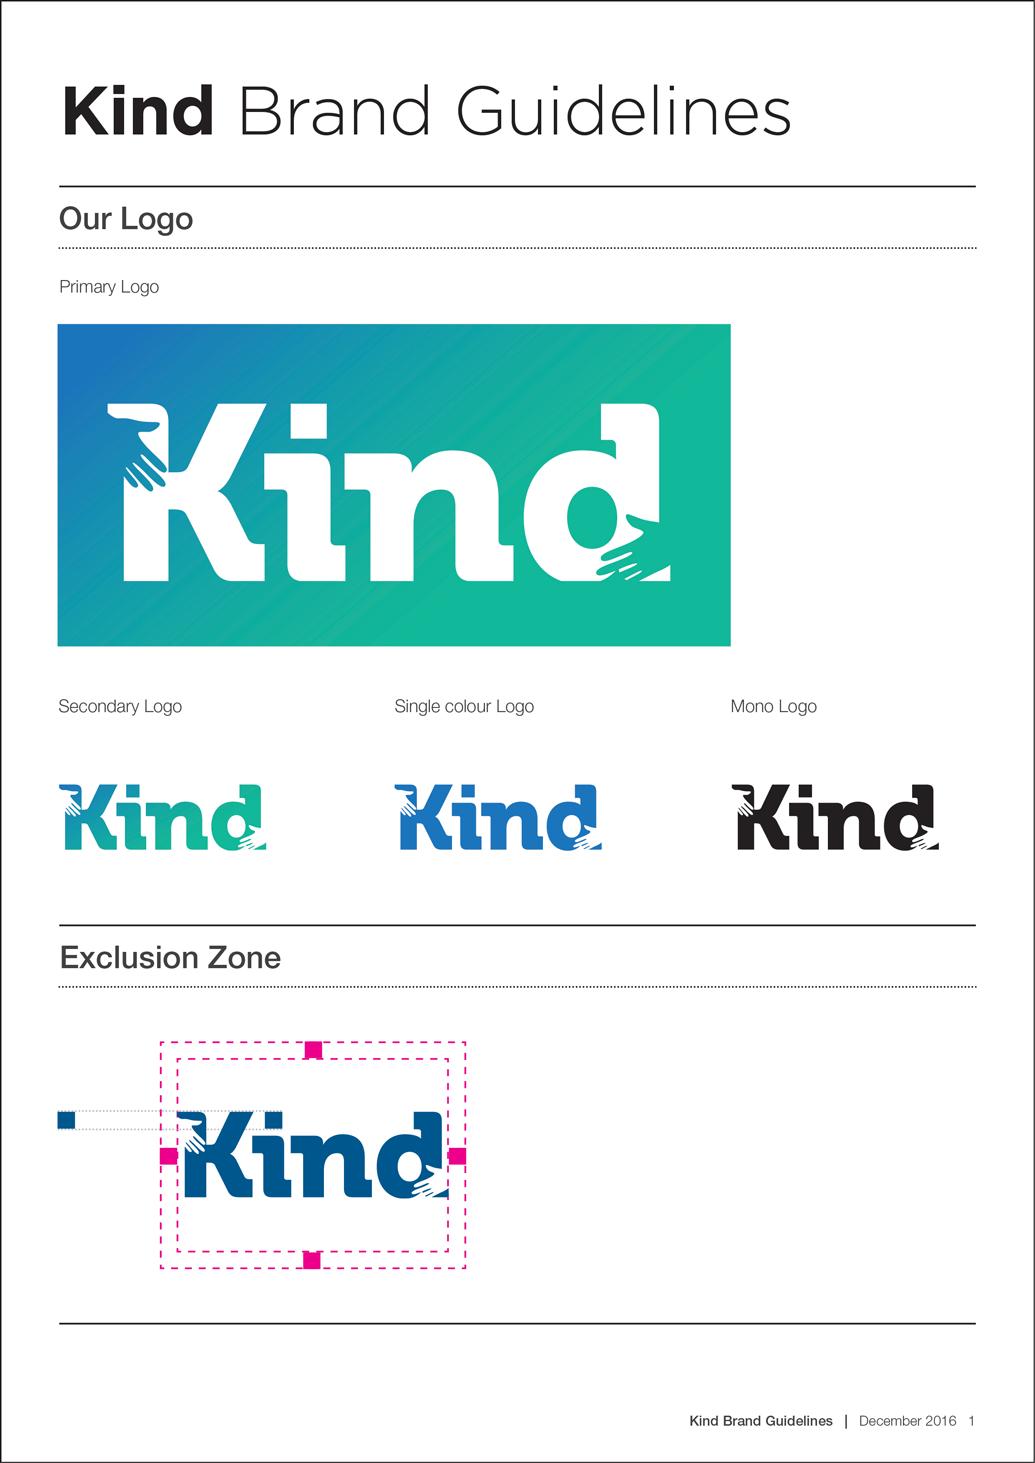 kind-brand-guidelines-0